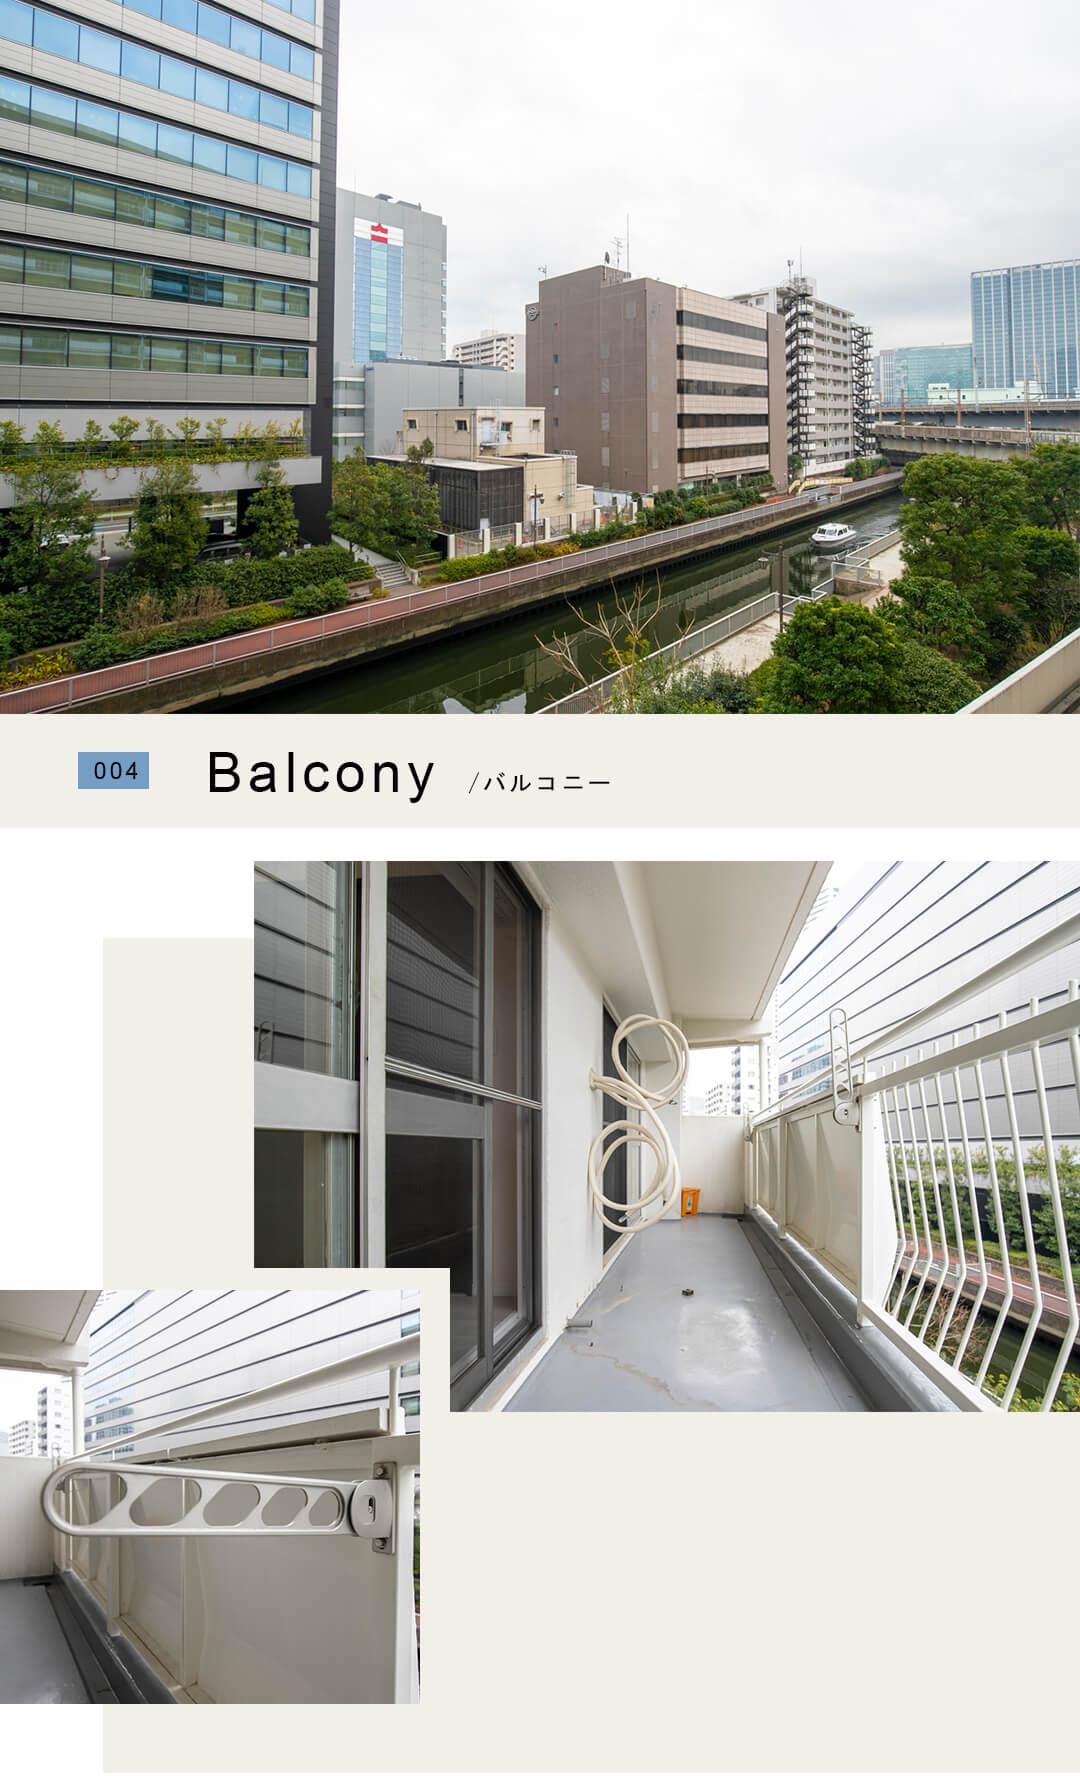 004,balcony,バルコニー